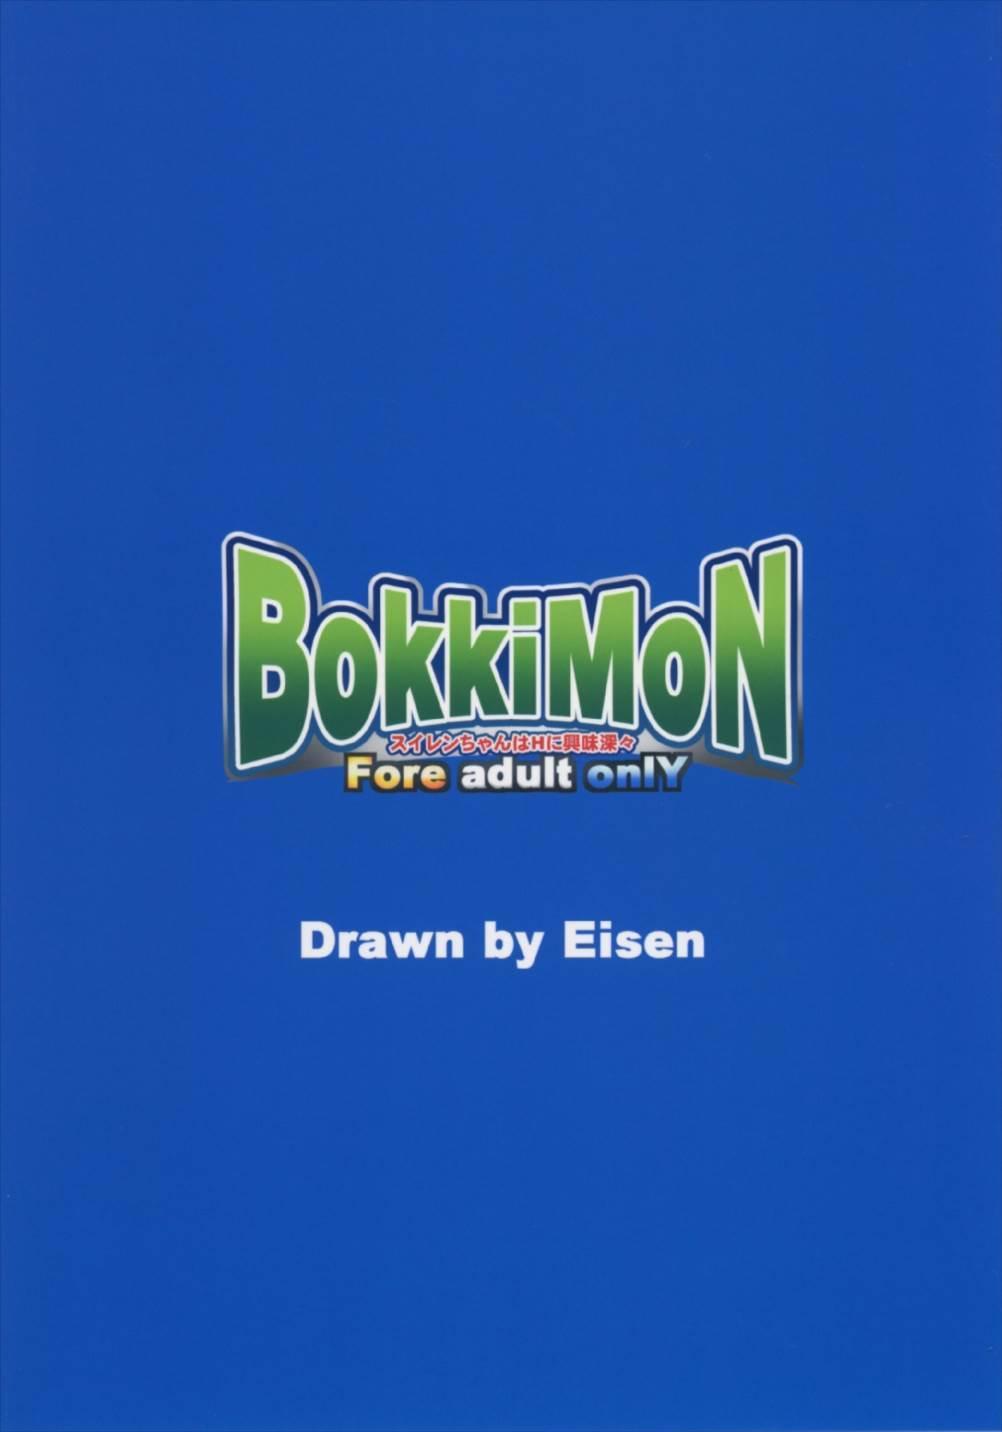 (C92) [Forever and ever (Eisen)] BOKKIMON -Suiren-chan wa H ni Kyoumi Shinshin- (Pokémon Sun and Moon) 33